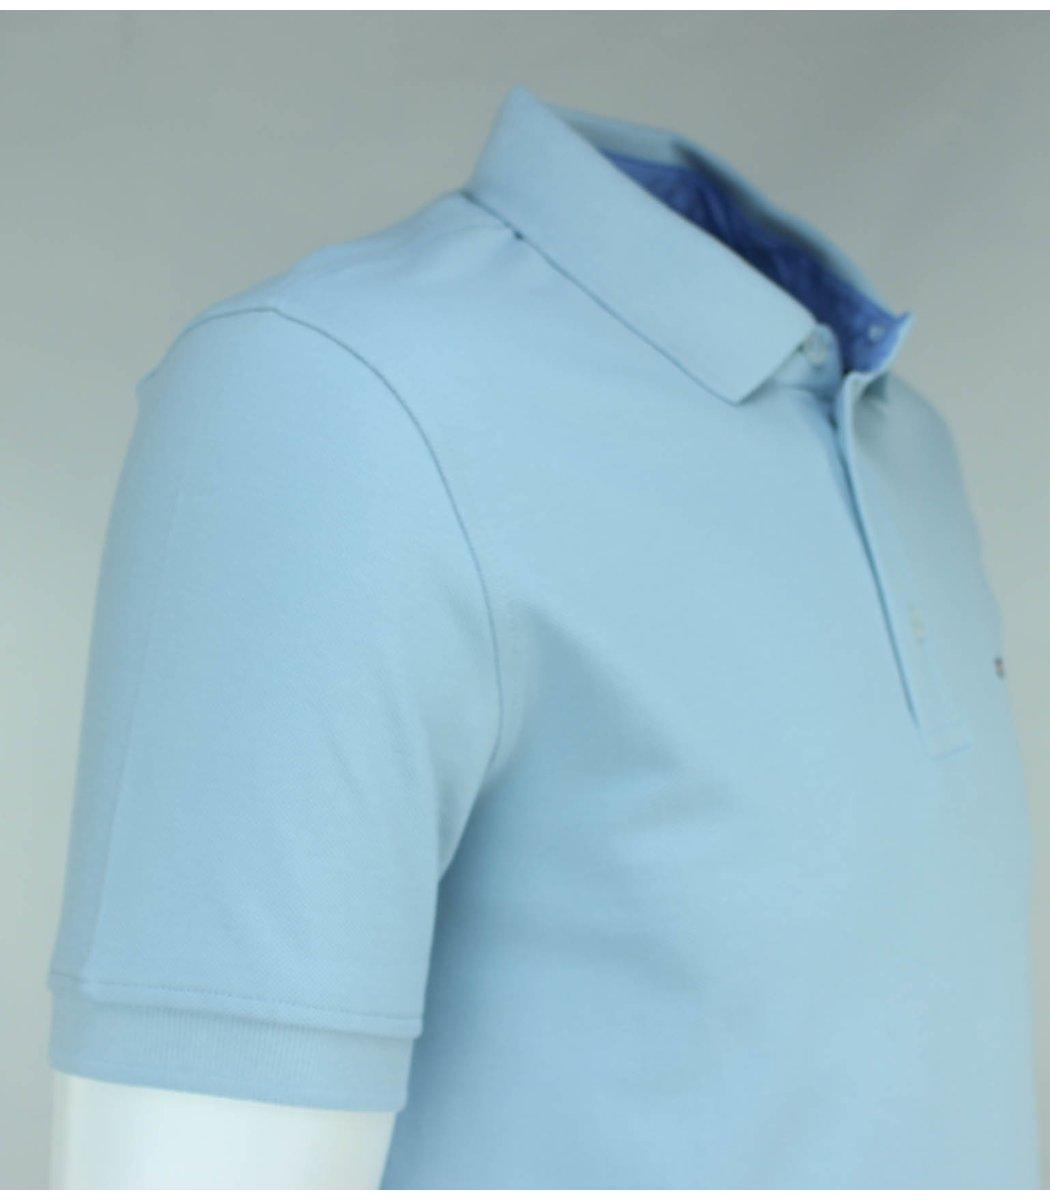 Светло-голубая футболка поло Tommy Hilfiger T3